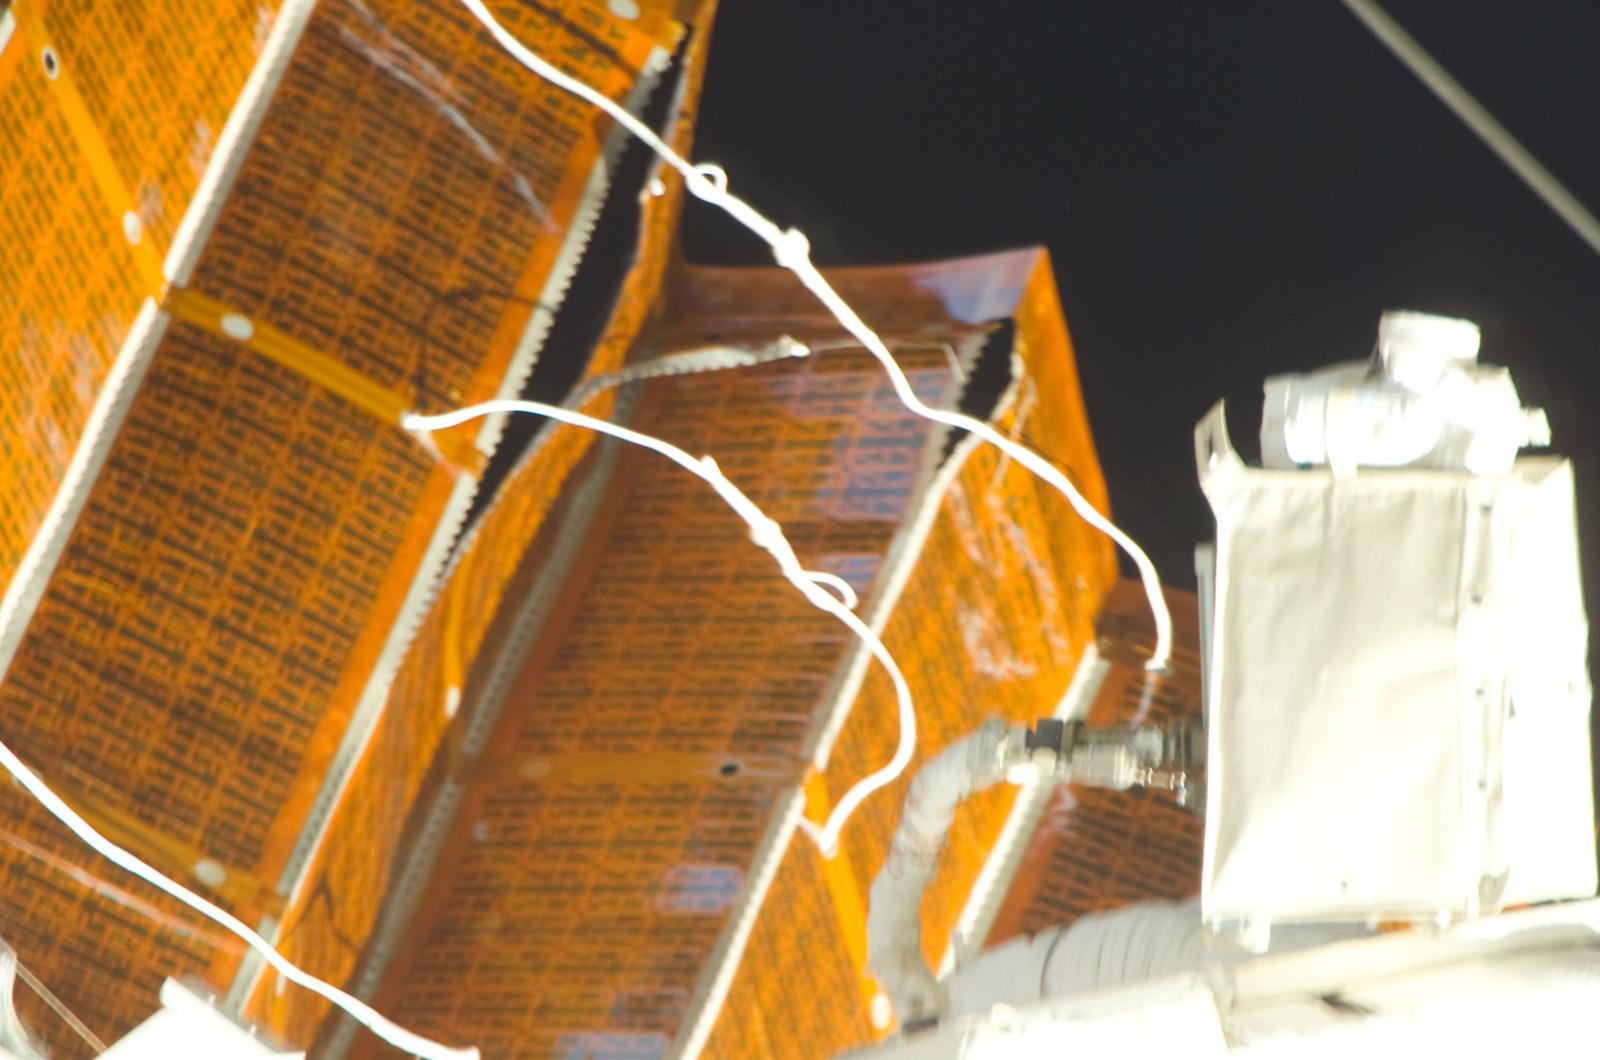 S120E008403 - STS-120 - Damaged P6 4B solar array